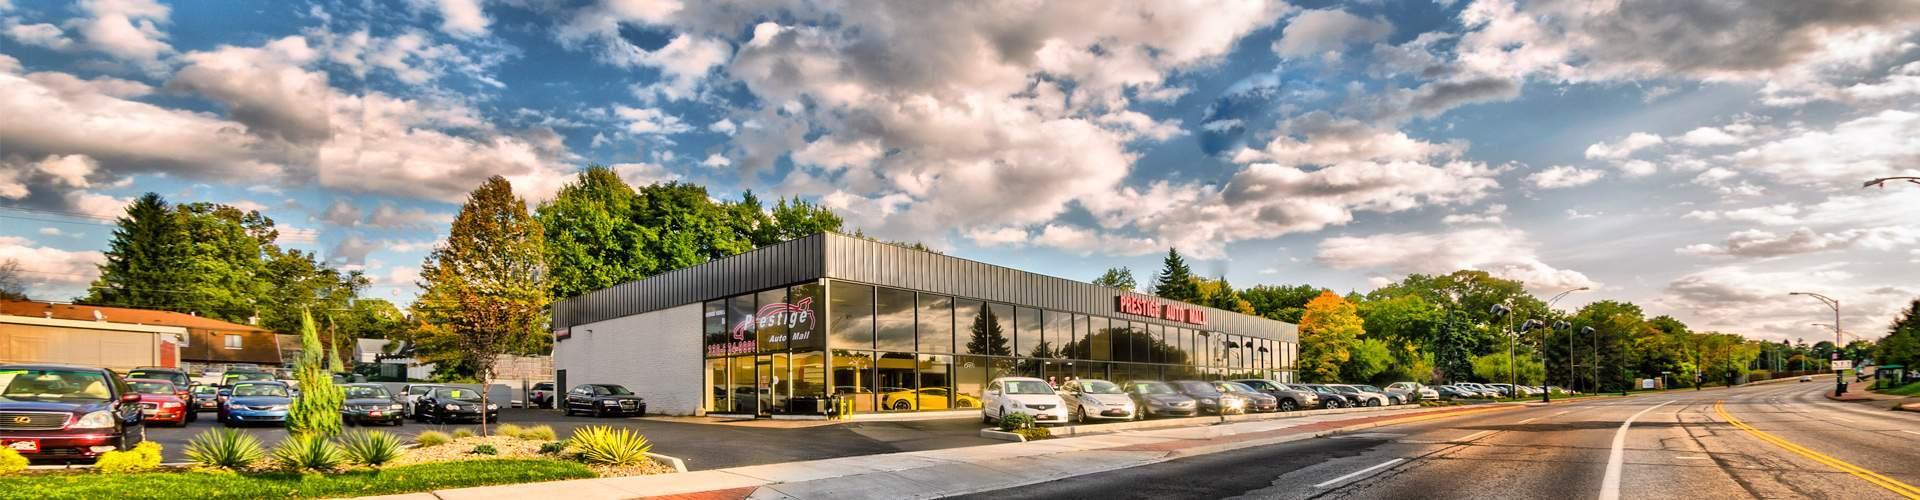 Used Car Dealership Cuyahoga Falls OH Used Cars Prestige Auto Mall - Used acura dealership